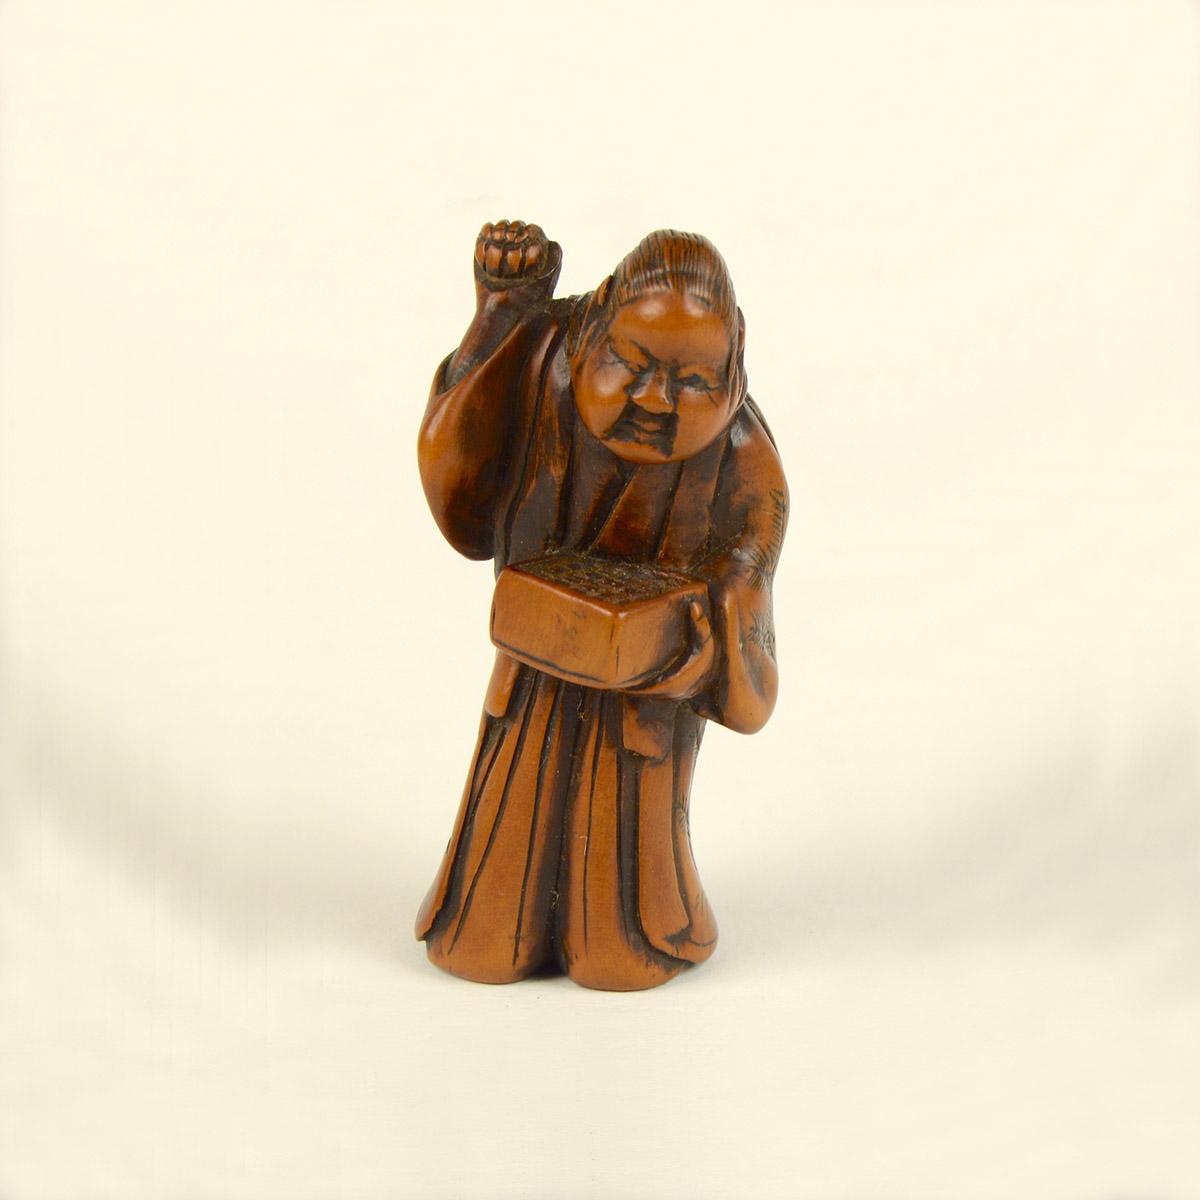 Holz Okame wirft Bohnen main_v.2